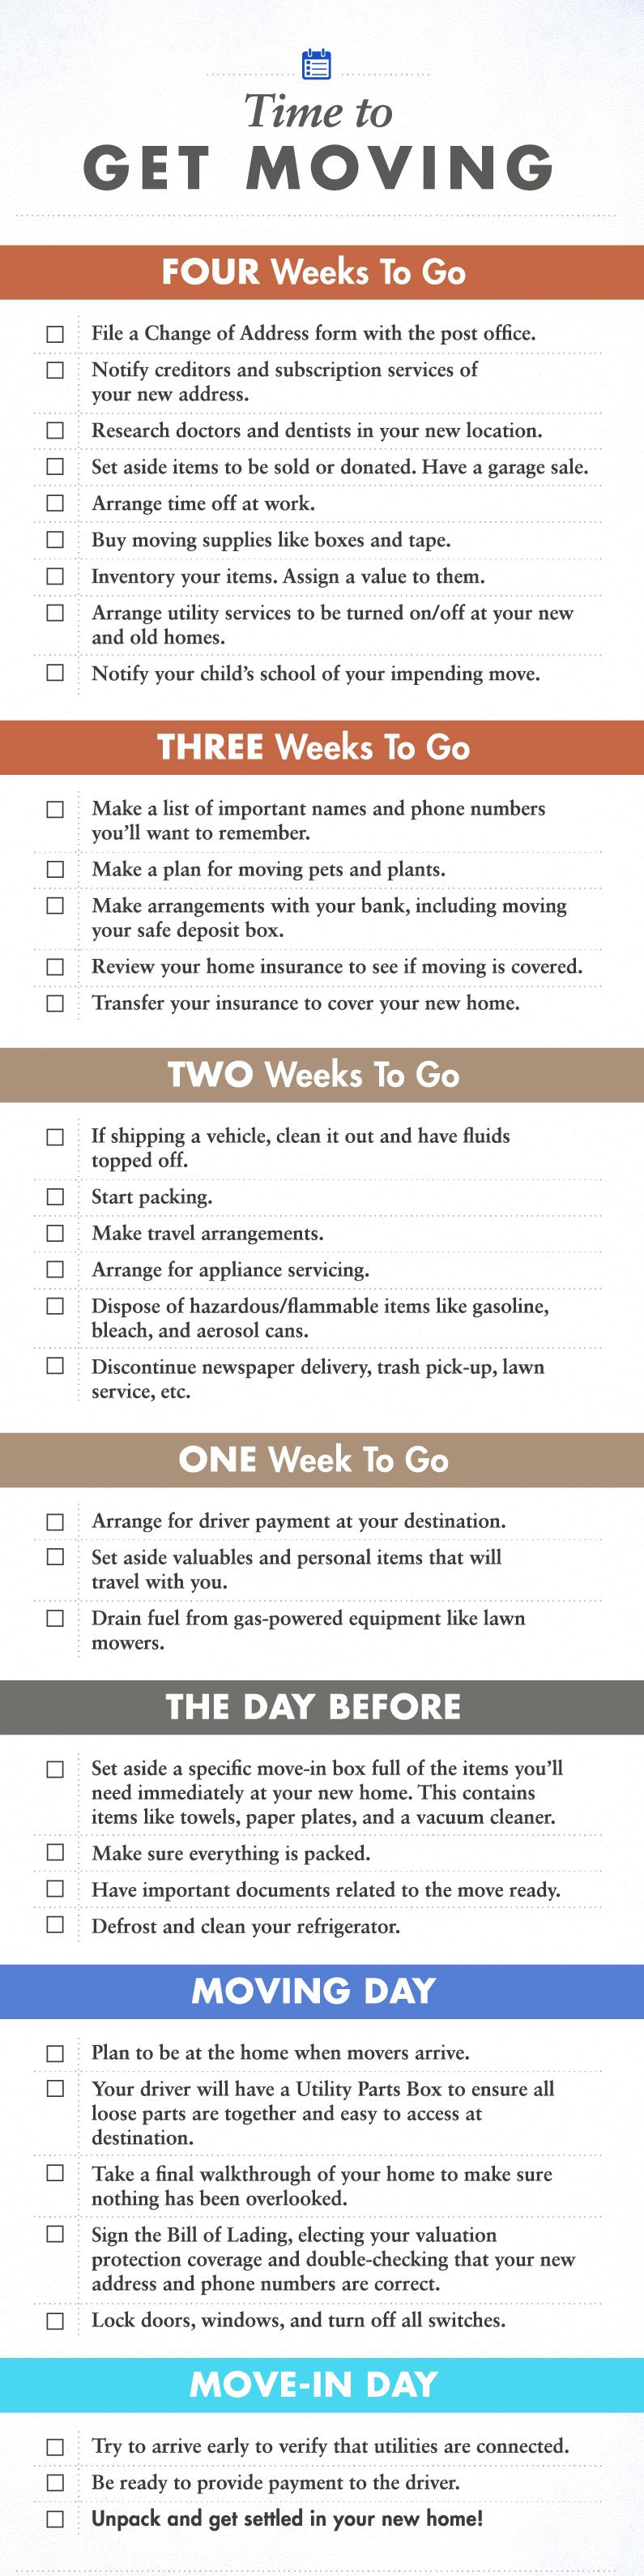 Moving-Checklist-Infographic-Florida Moving Checklist: 4 Week Countdown Orlando   Central Florida